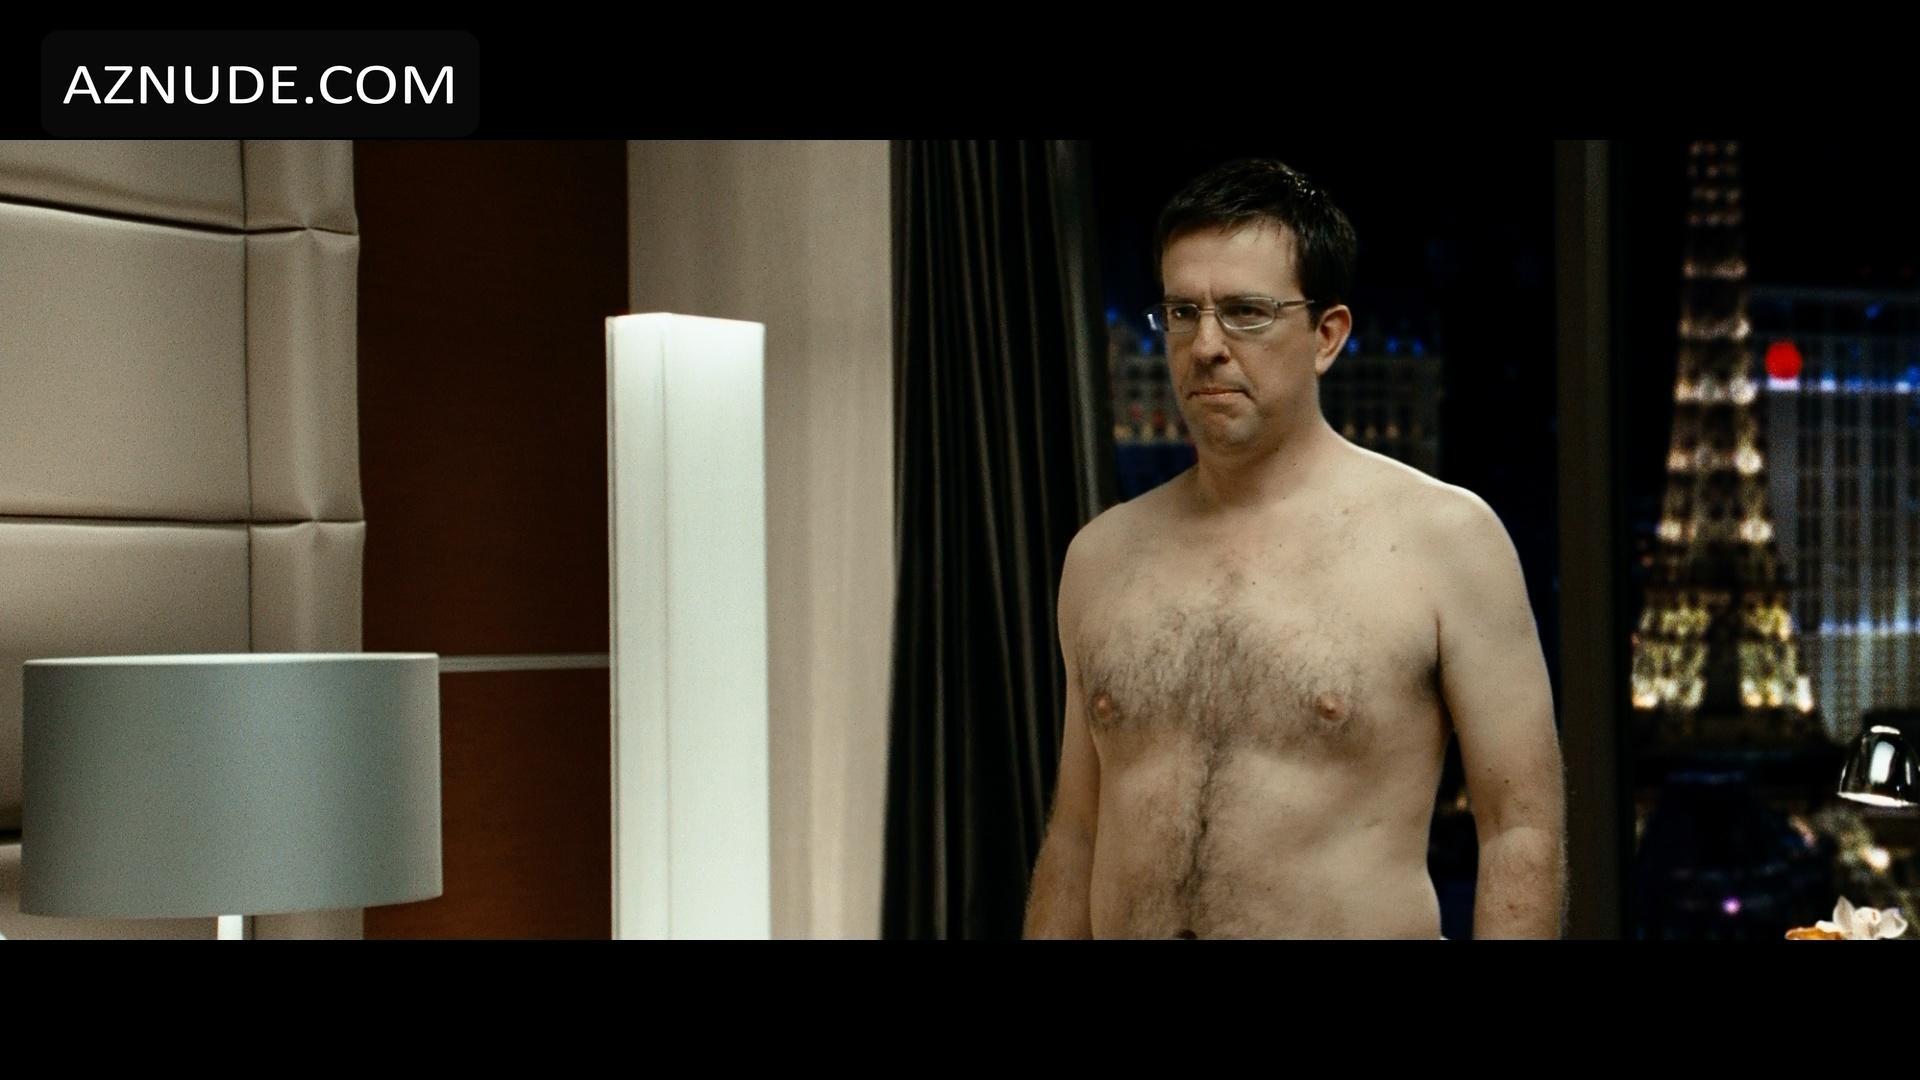 Ed helms to be frank drebin in the naked gun reboot